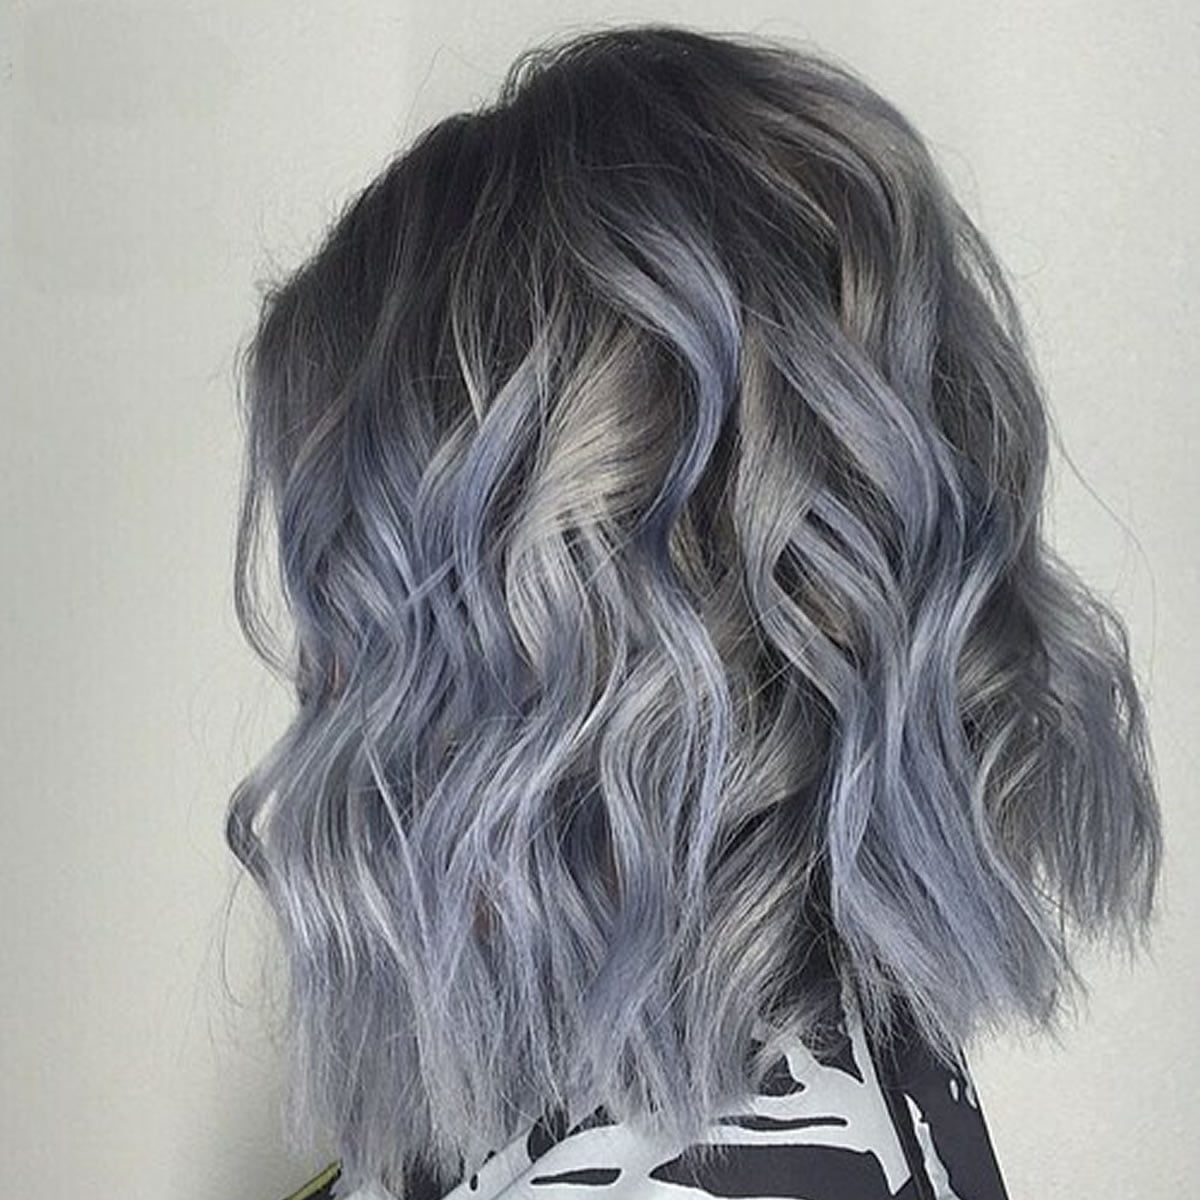 Grey Hair Trend – 20 Glamorous Hairstyles for Women 2018 ... - photo#11